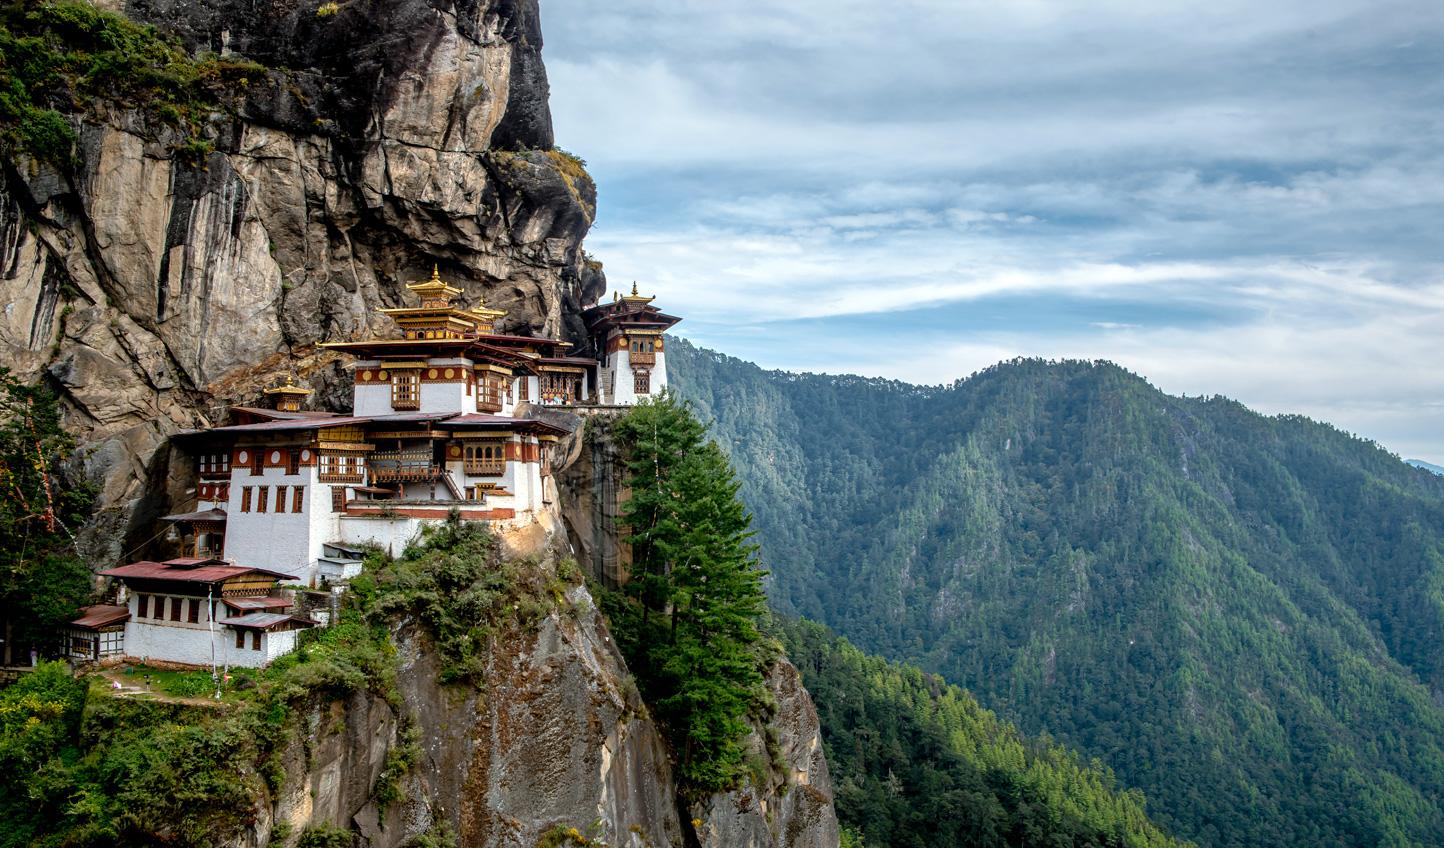 Embark on an iconic hike up to Takstang Monastery